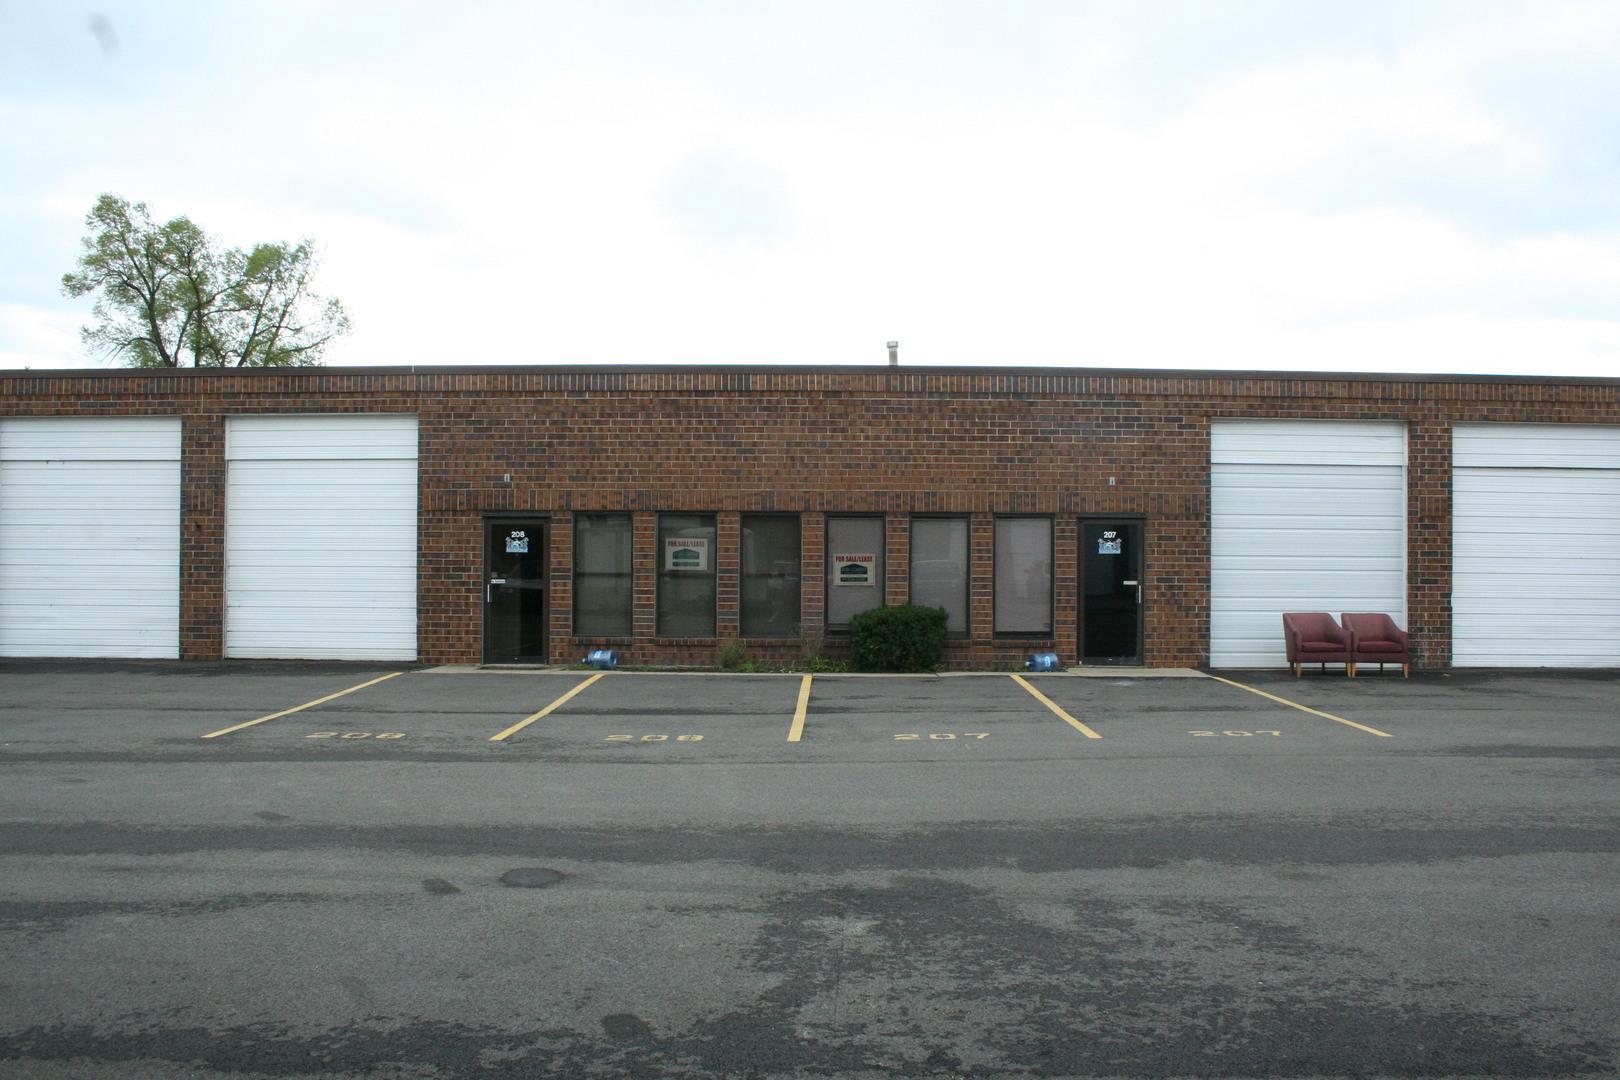 Illinois lake county wauconda - 950 North Rand Road 207 208 Wauconda Lake County Il 60084